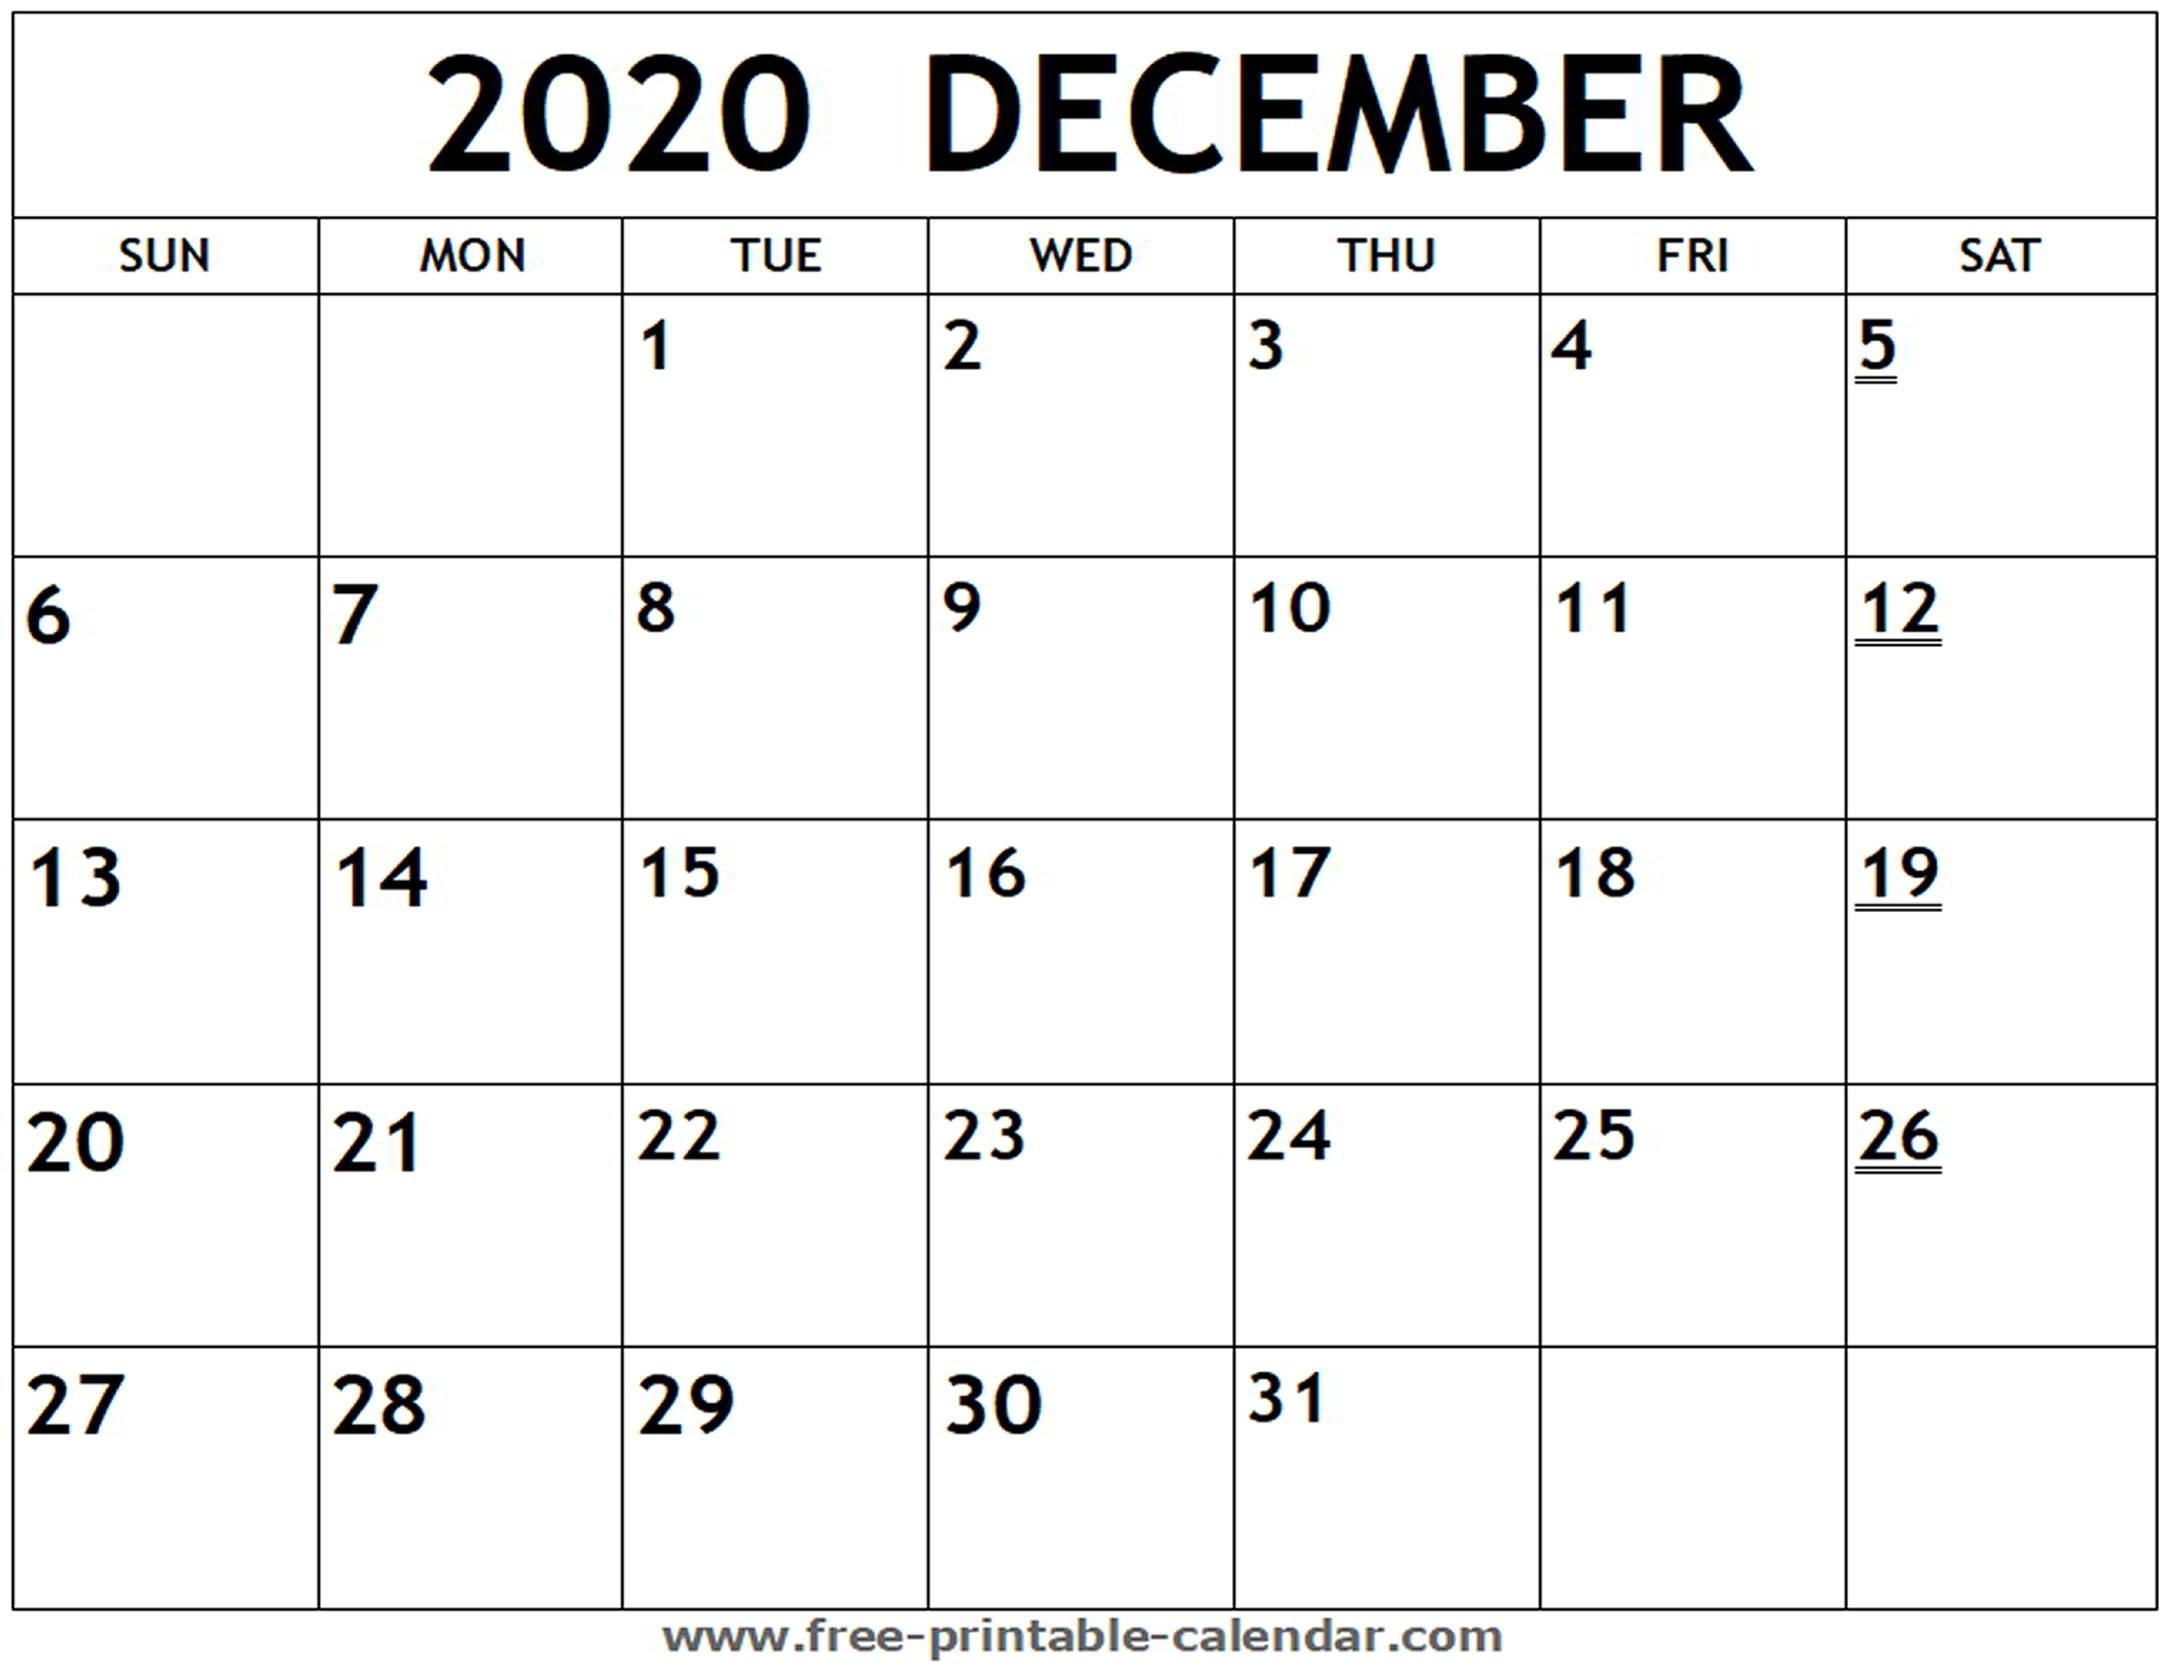 Printable 2020 December Calendar - Free-Printable-Calendar